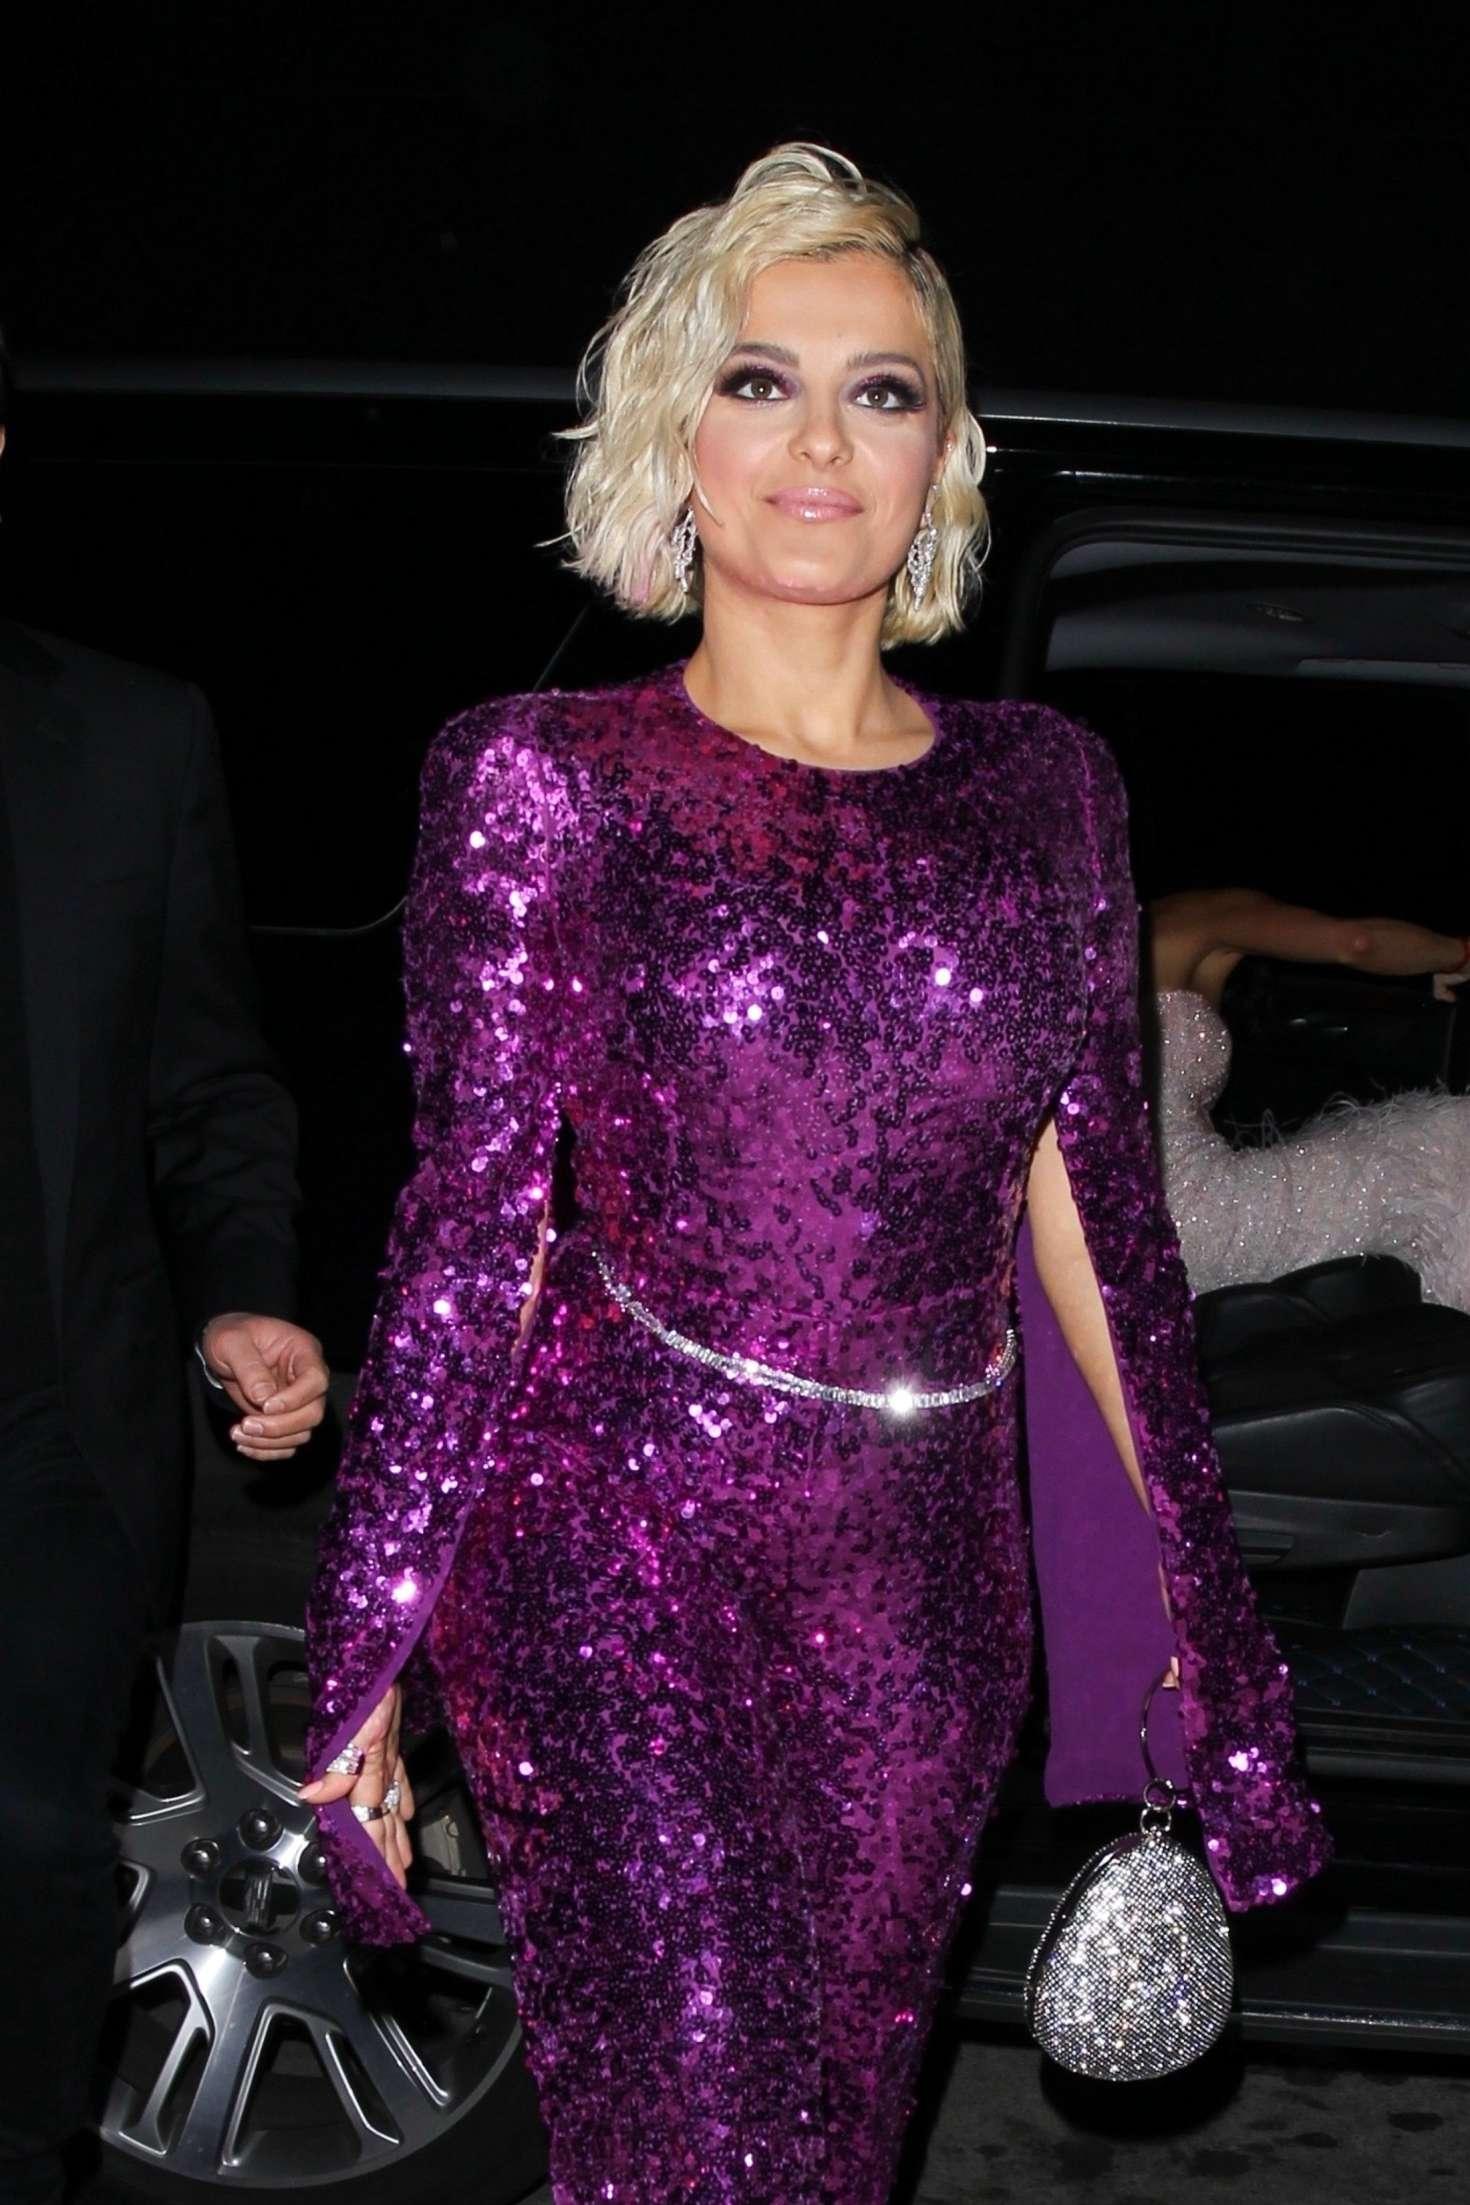 Bebe Rexha at Diana Ross 75th Birthday Bash in Hollywood